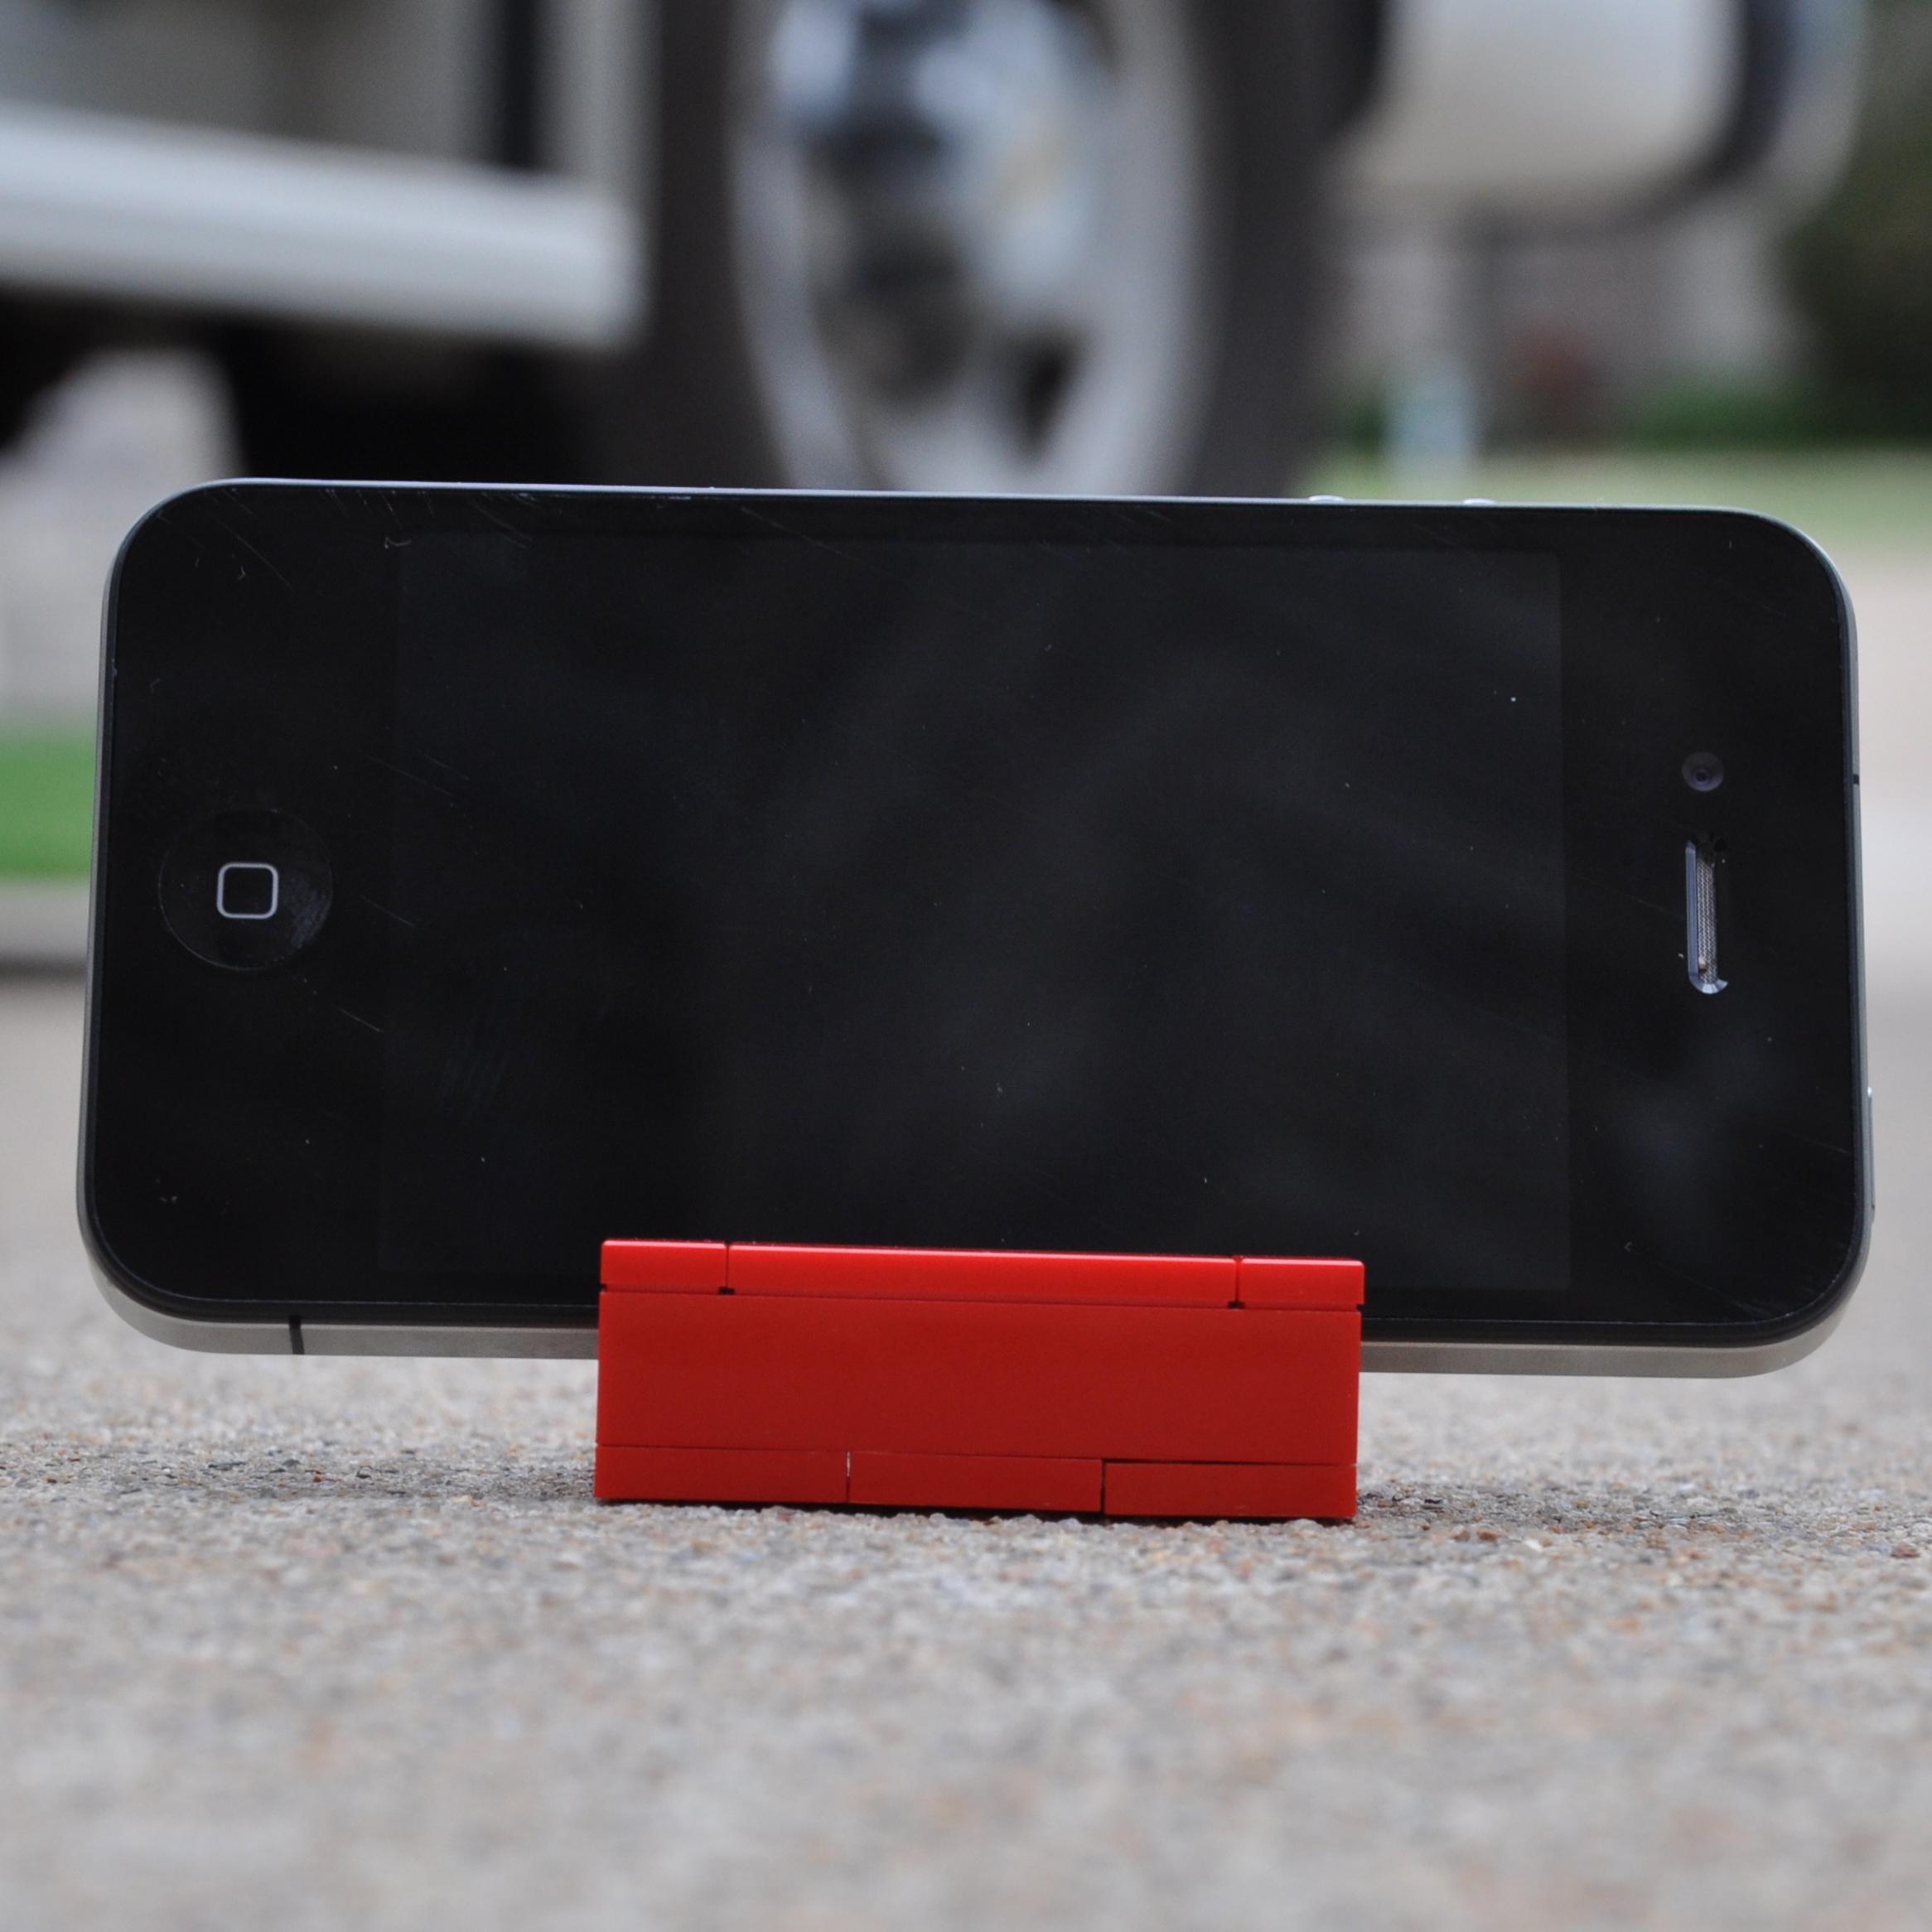 Lego IPhone Dock